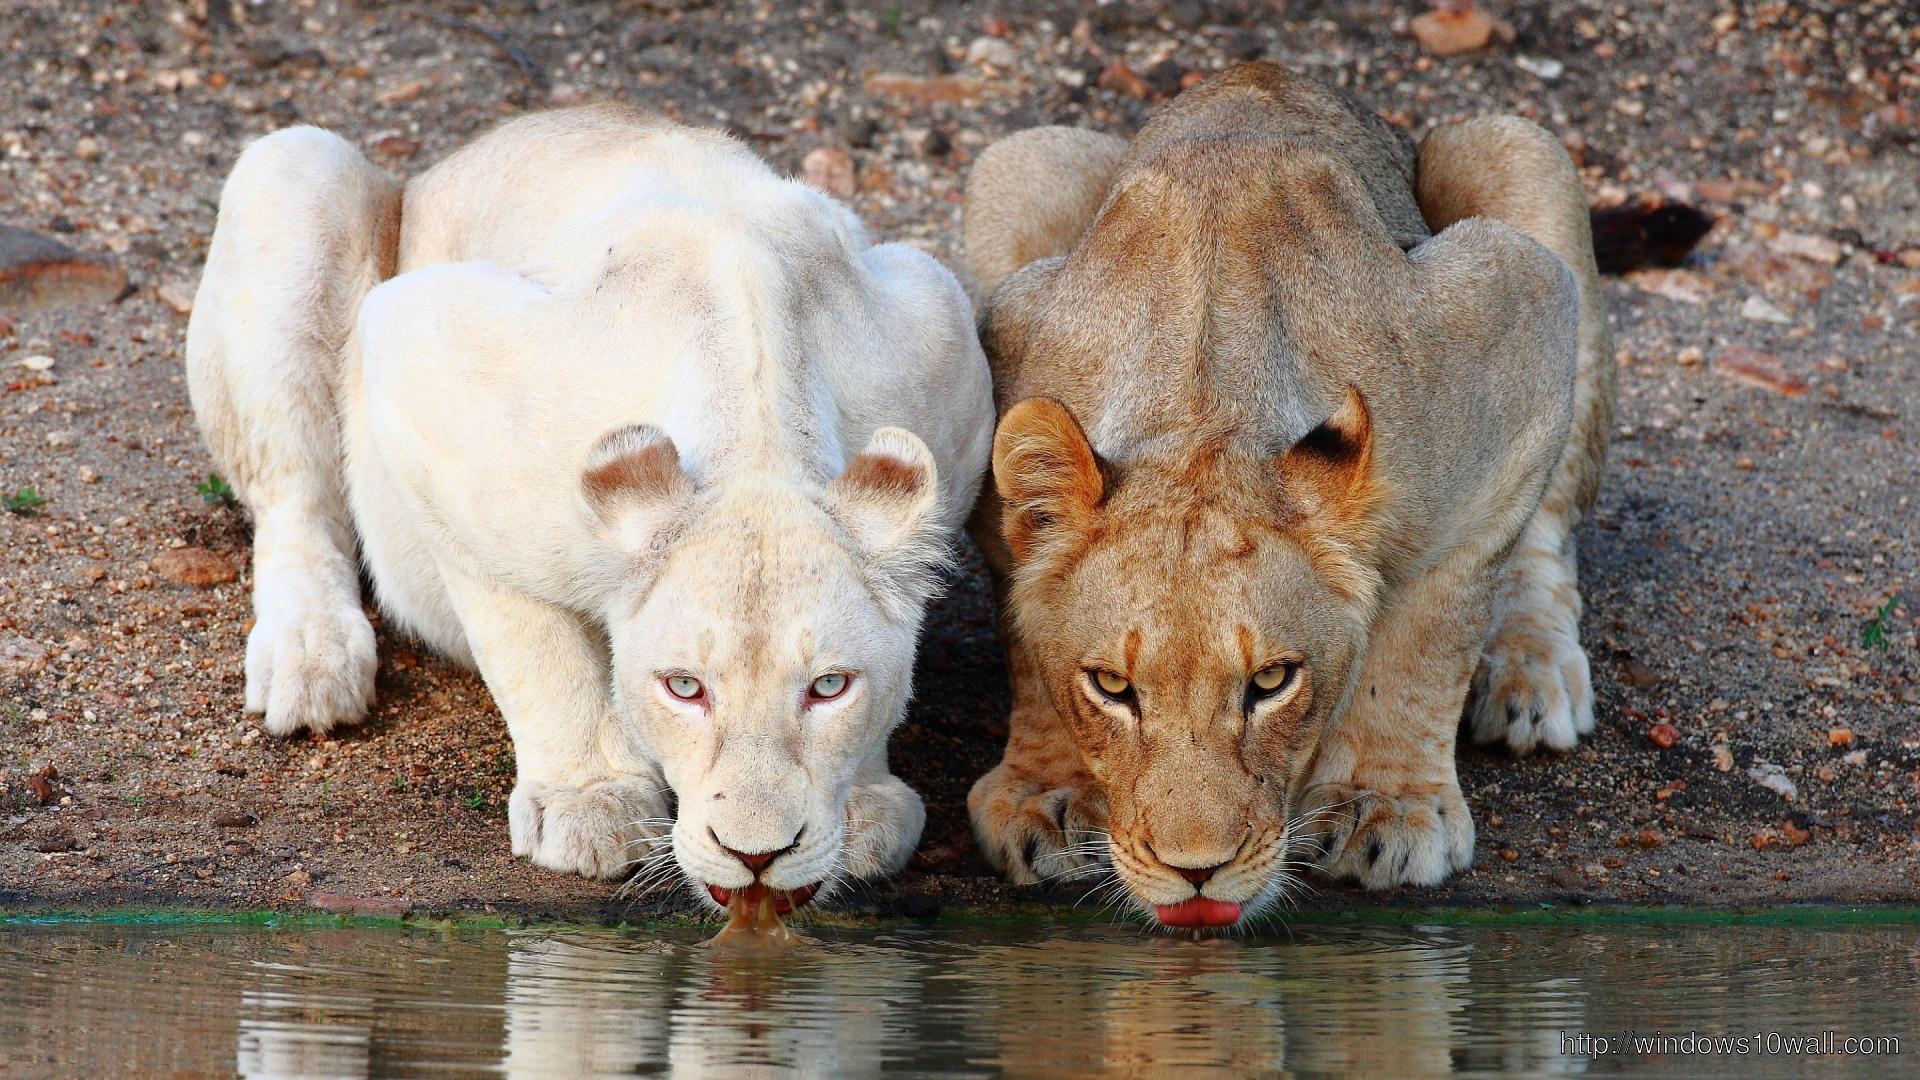 Popular Wallpaper Lion Facebook - lions-drinking-water-wallpaper  Picture_99335.jpg